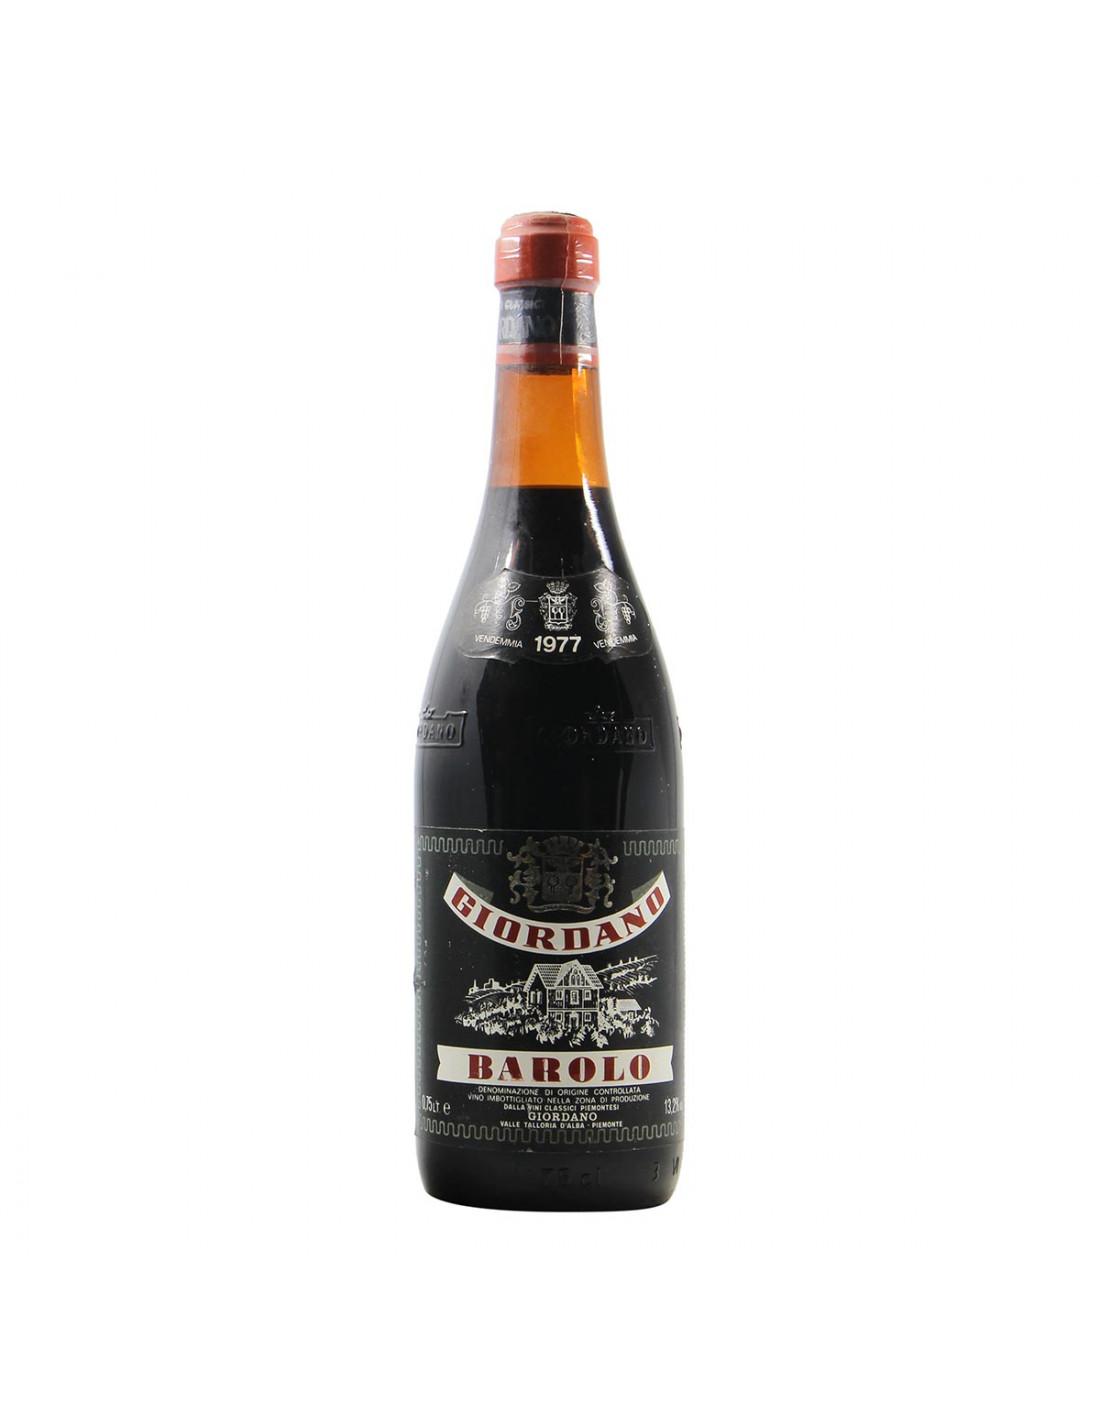 Giordano Barolo 1977 Grandi Bottiglie